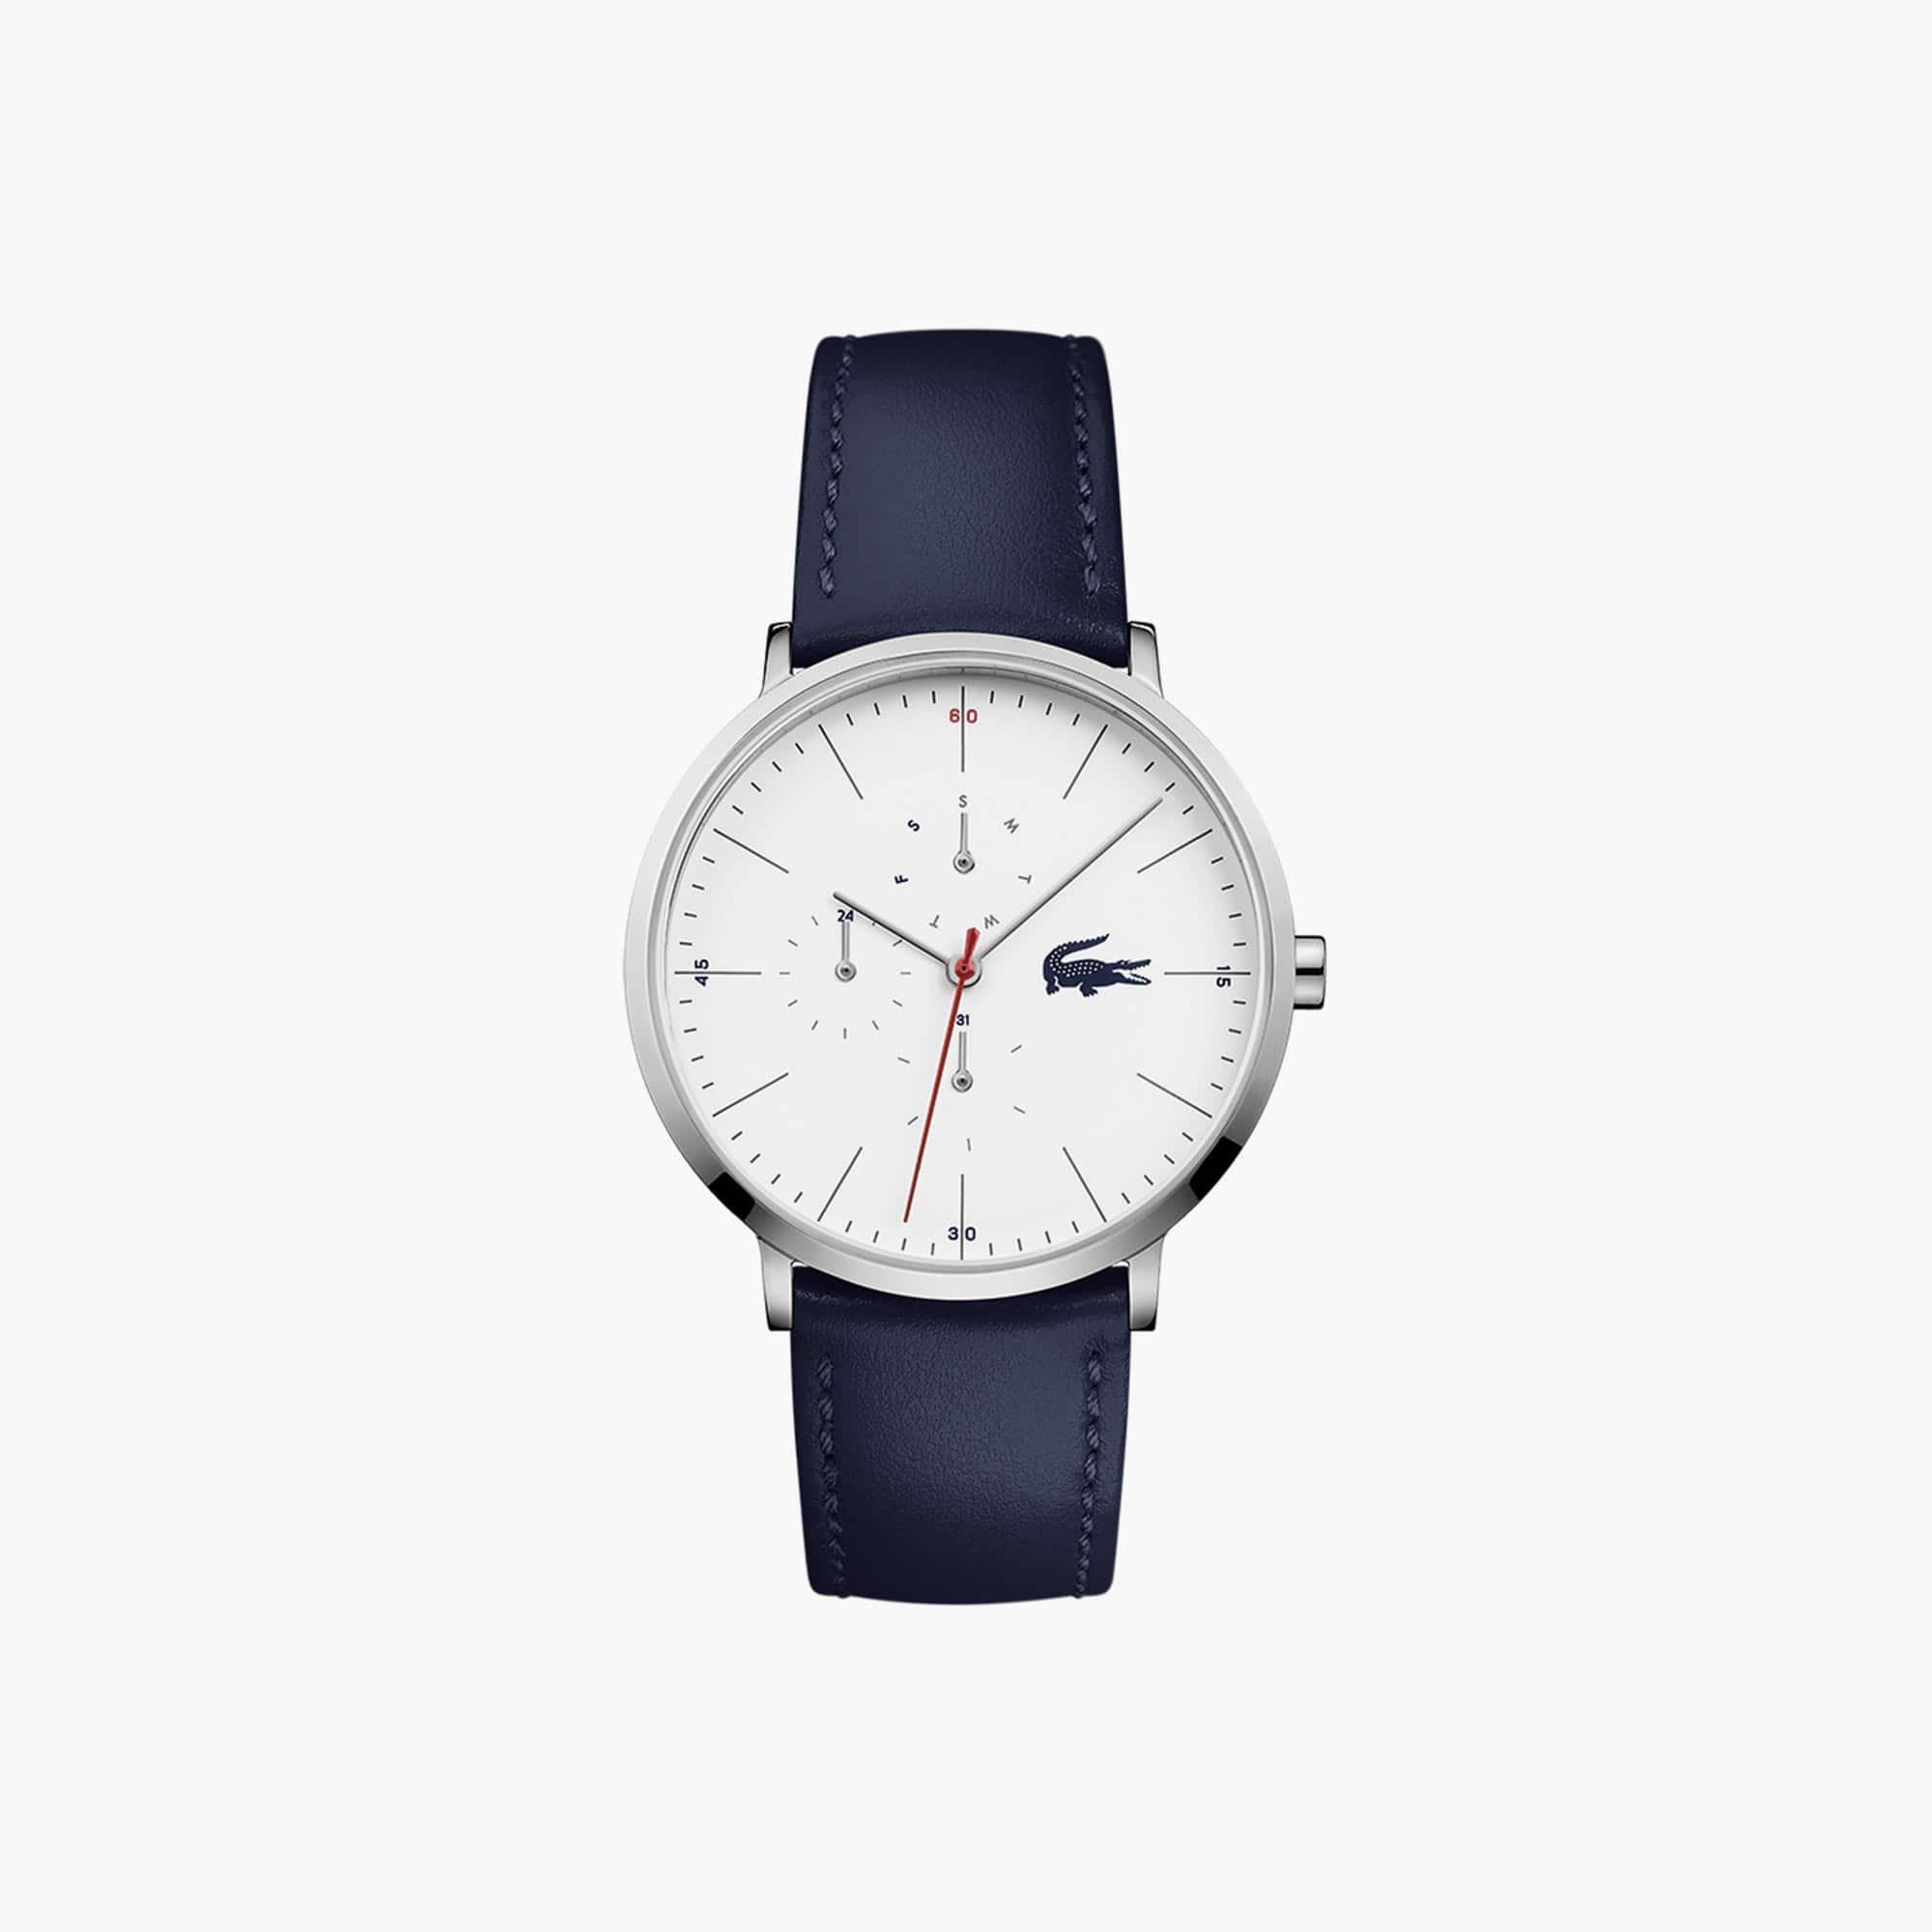 Relógio ultra slim multifunções Moon de homem com bracelete de pele azul